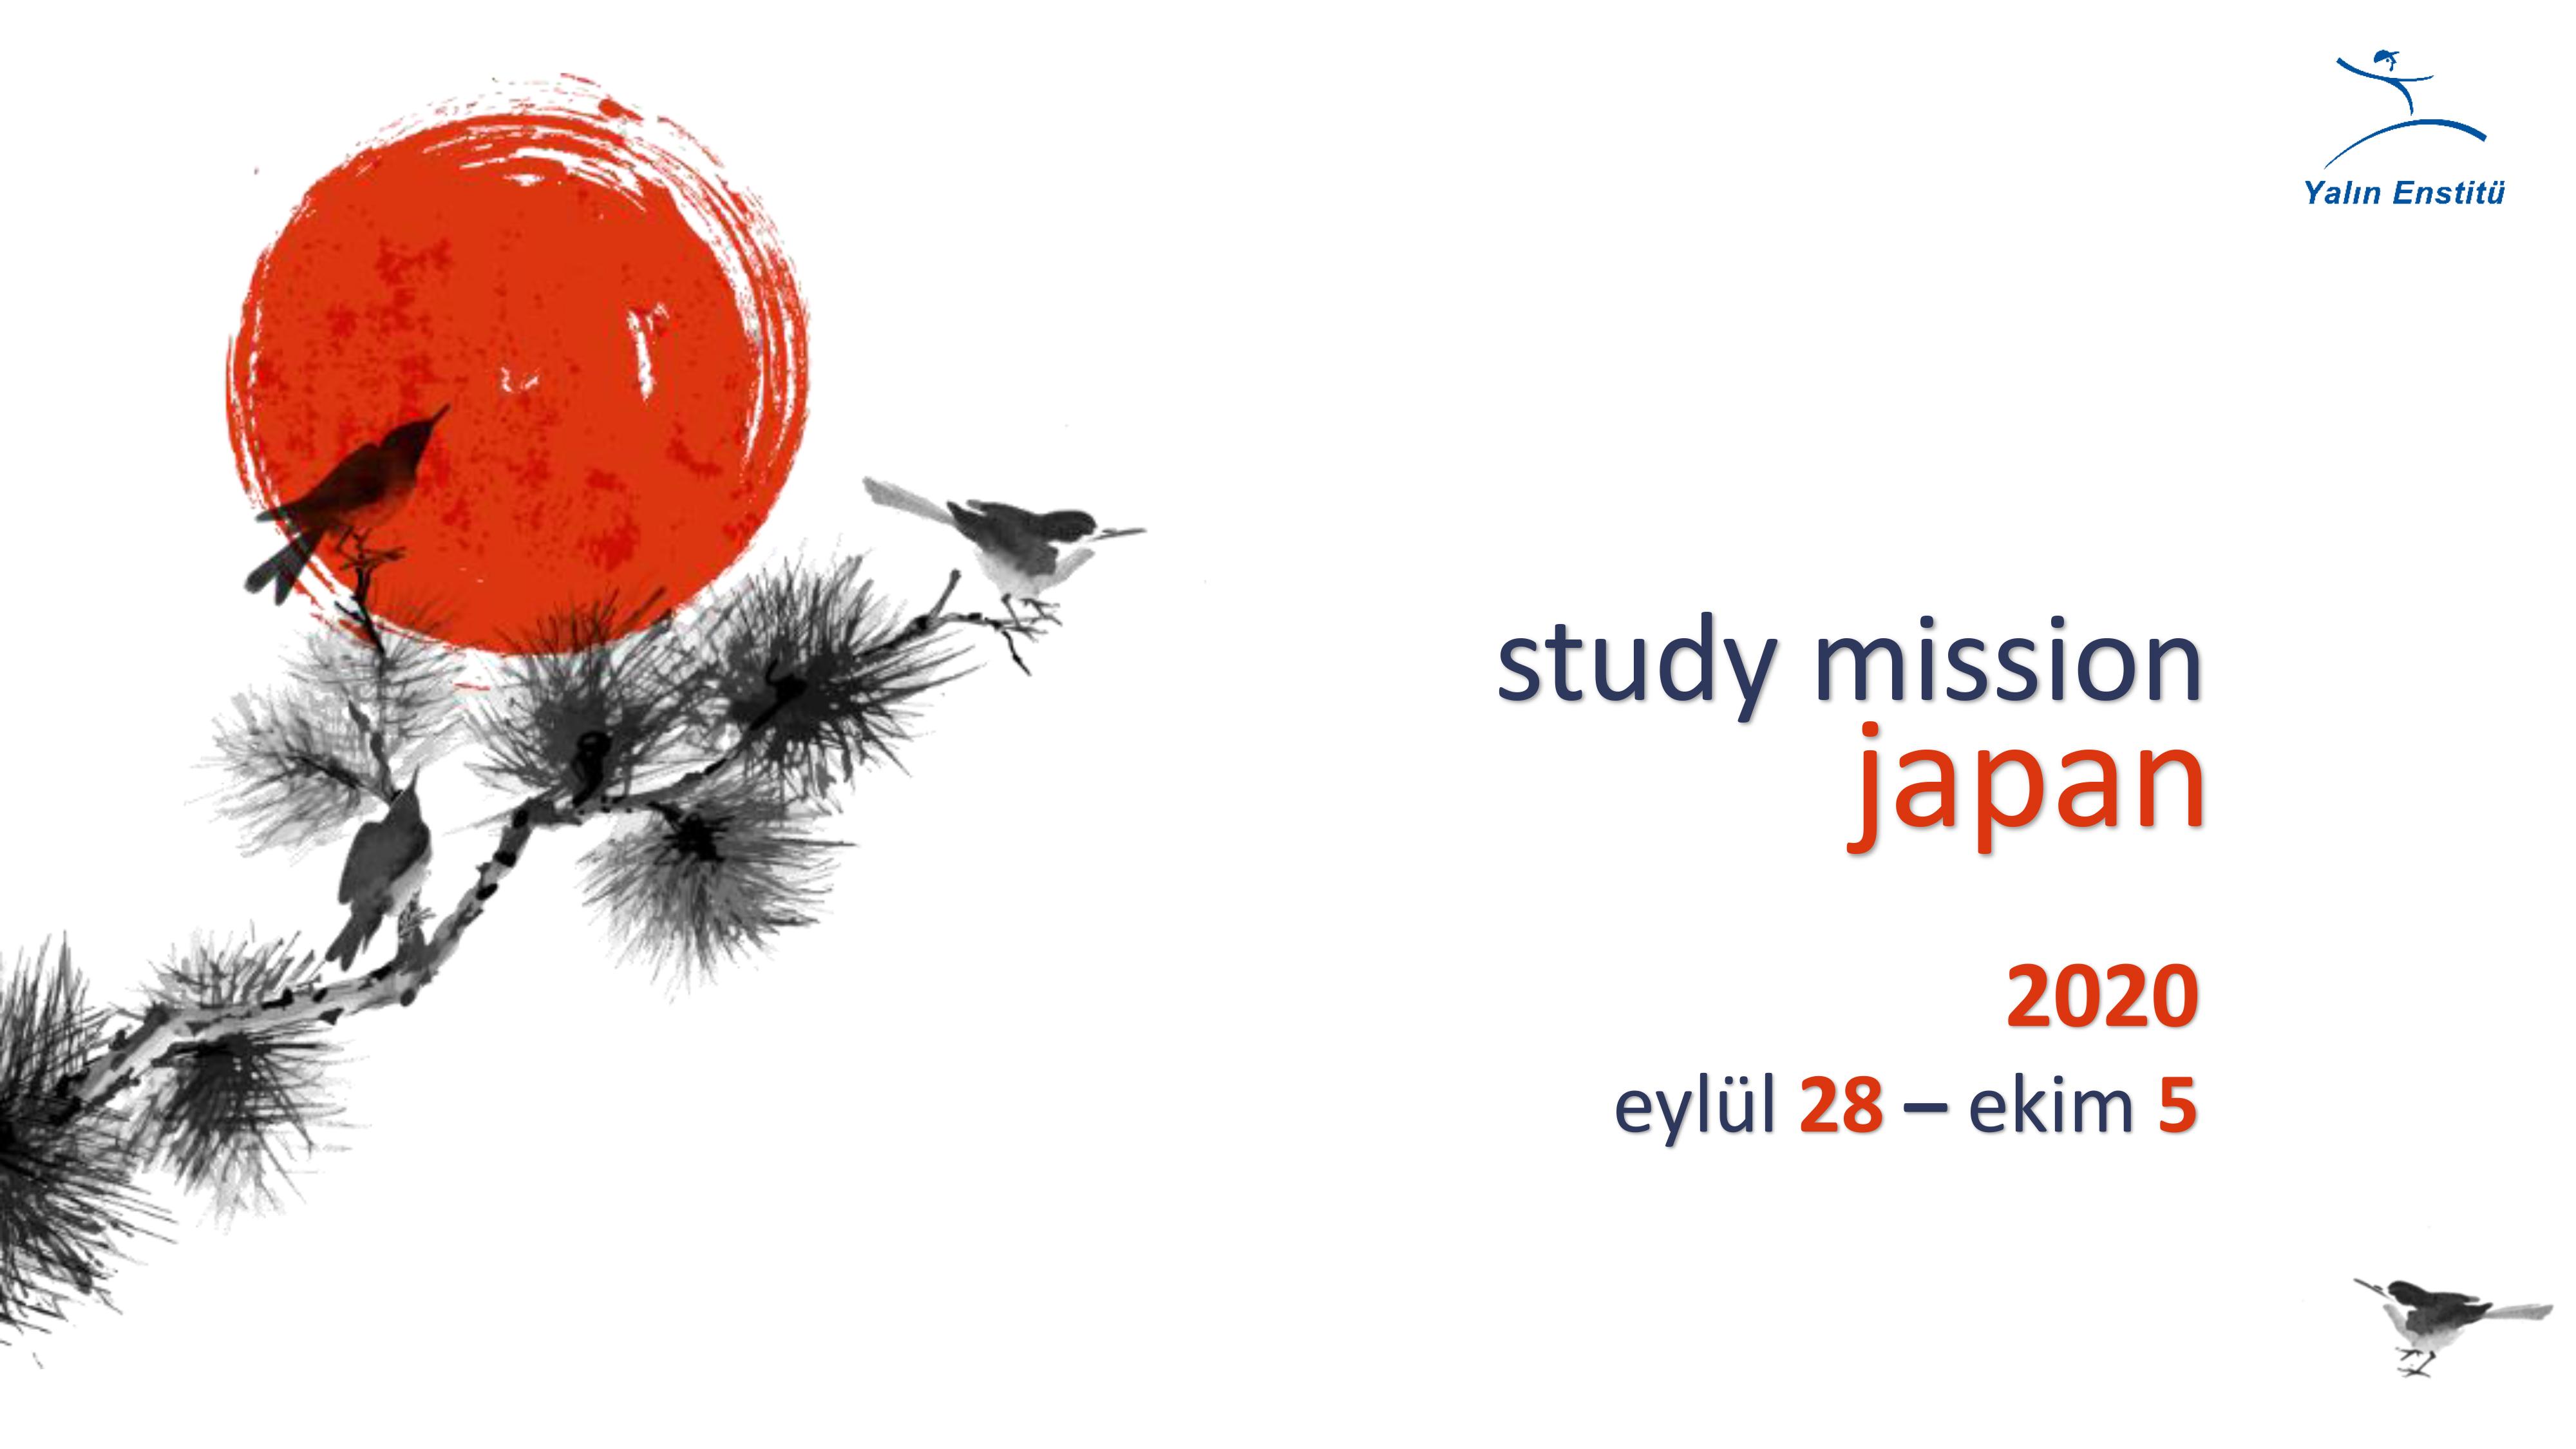 Study Mission Japan 2020